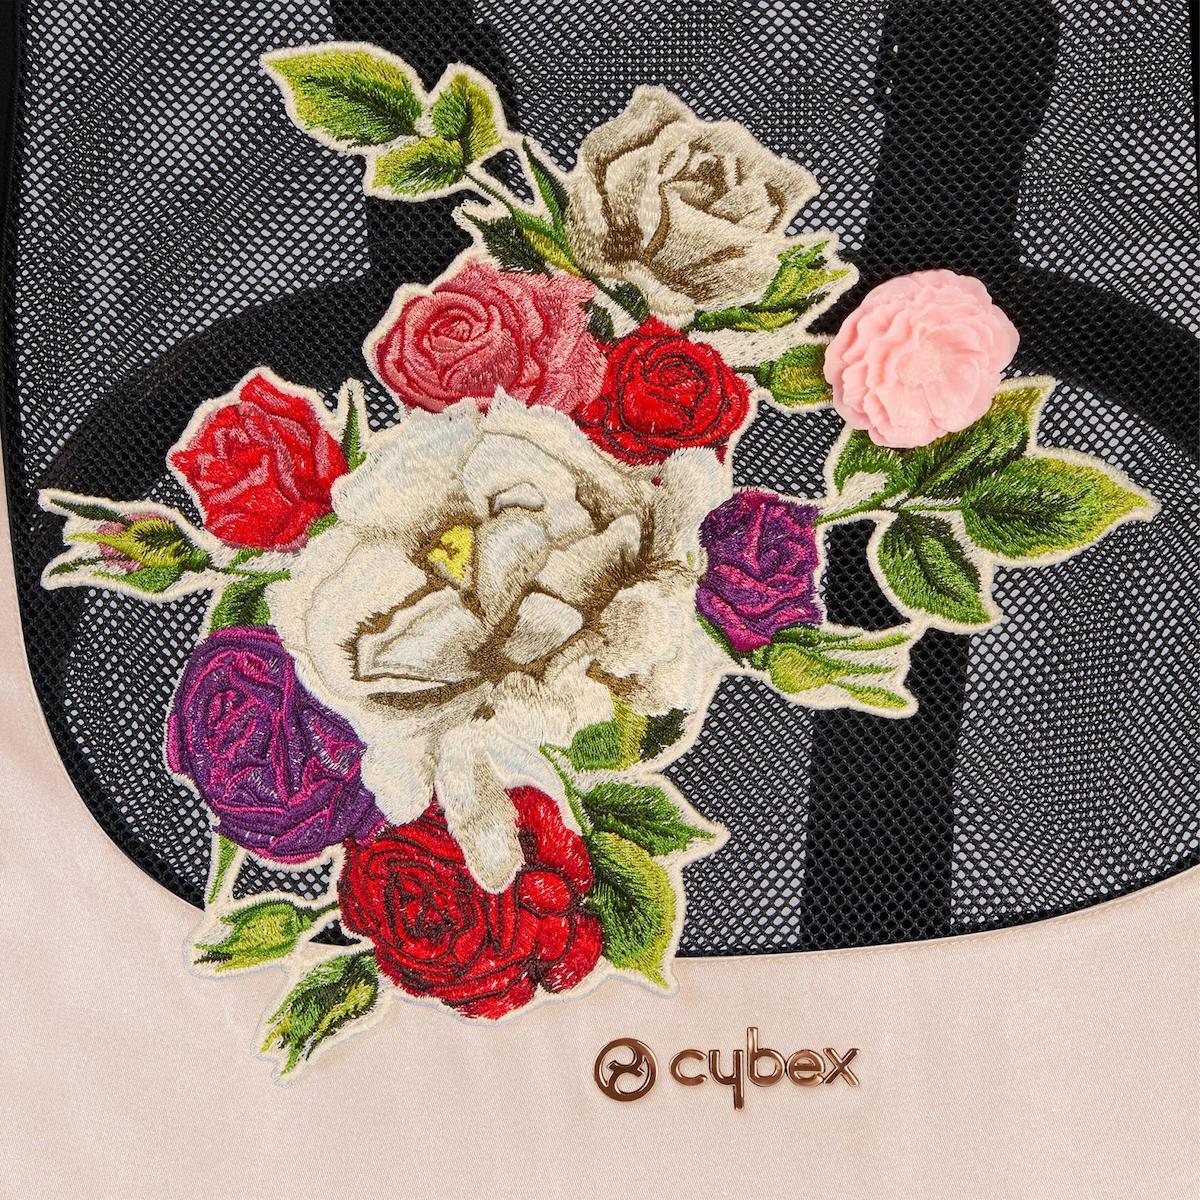 Asiento-pack silla MIOS Cybex spring blossom light-light beige